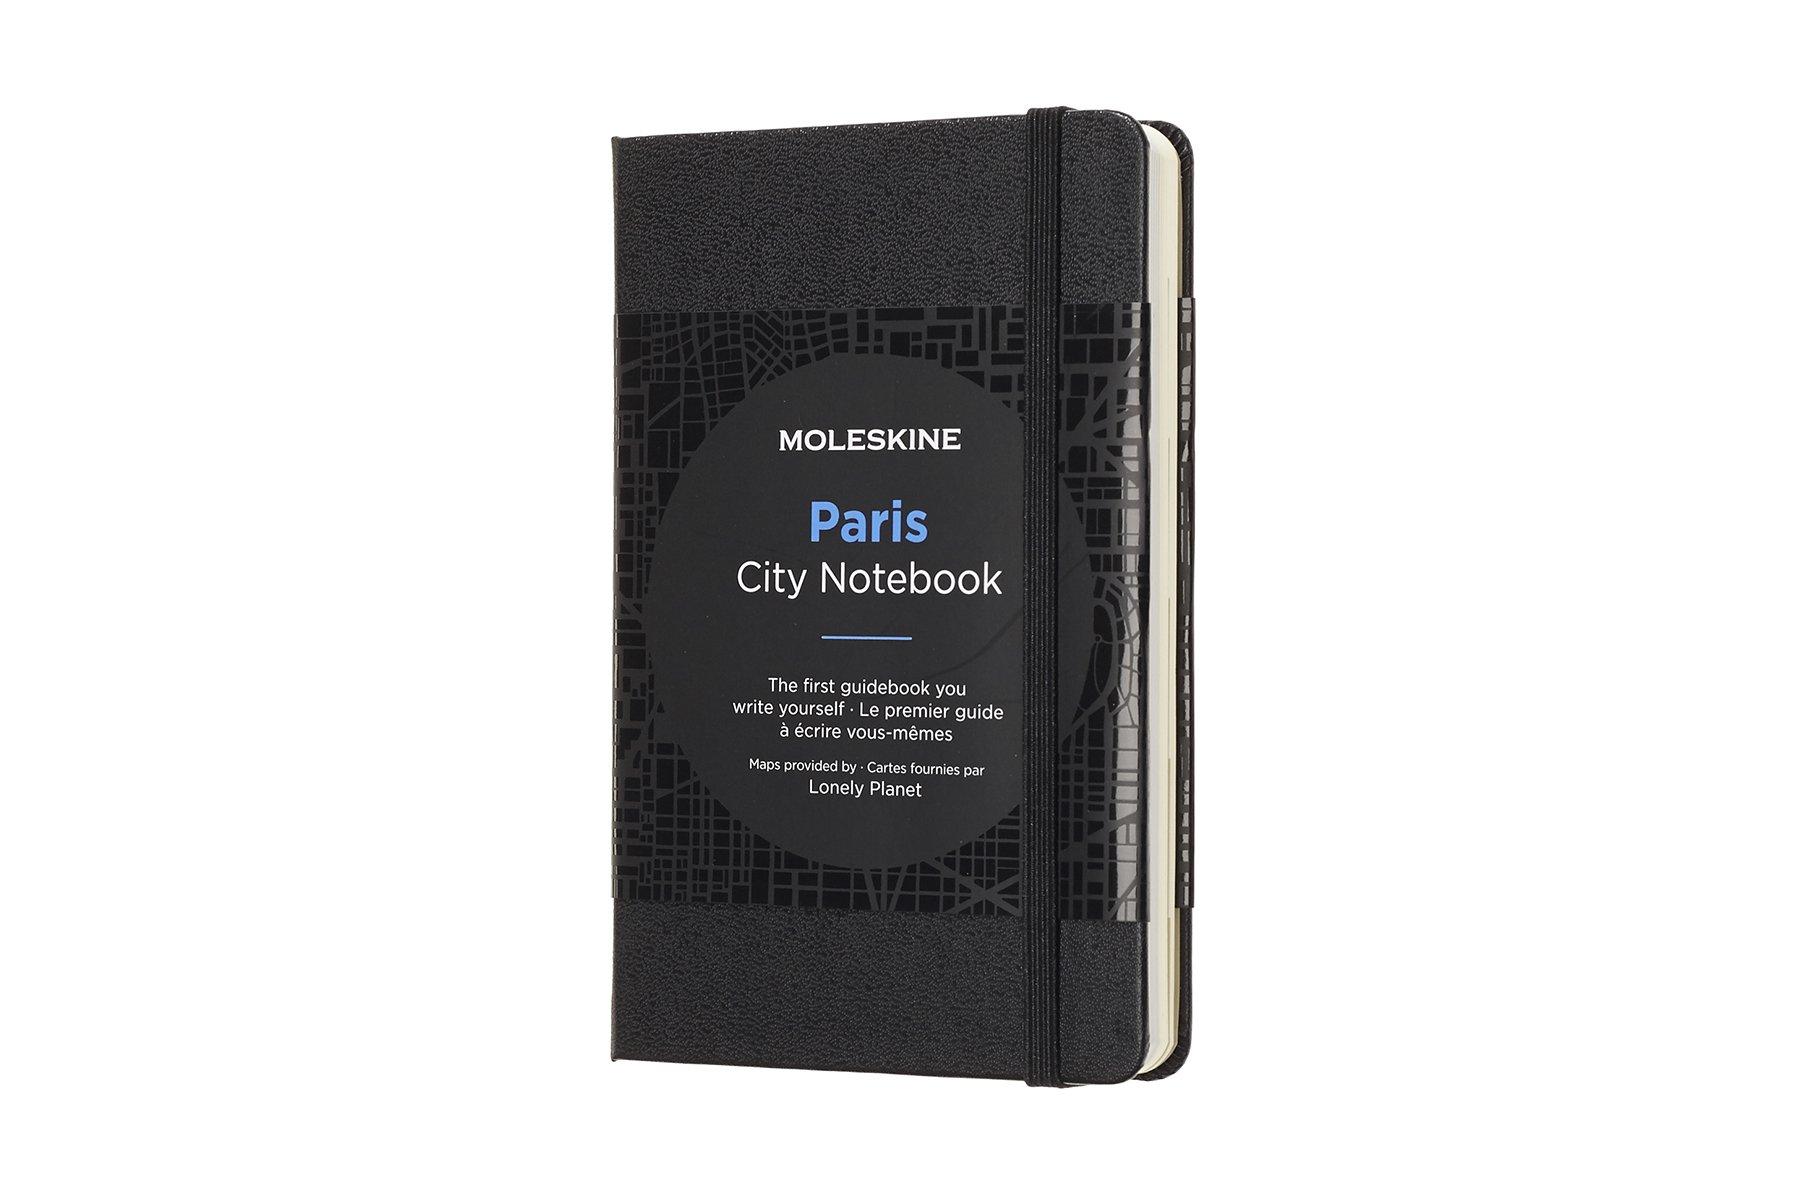 Moleskine City Notebook Paris, Pocket, Black, Hard Cover...